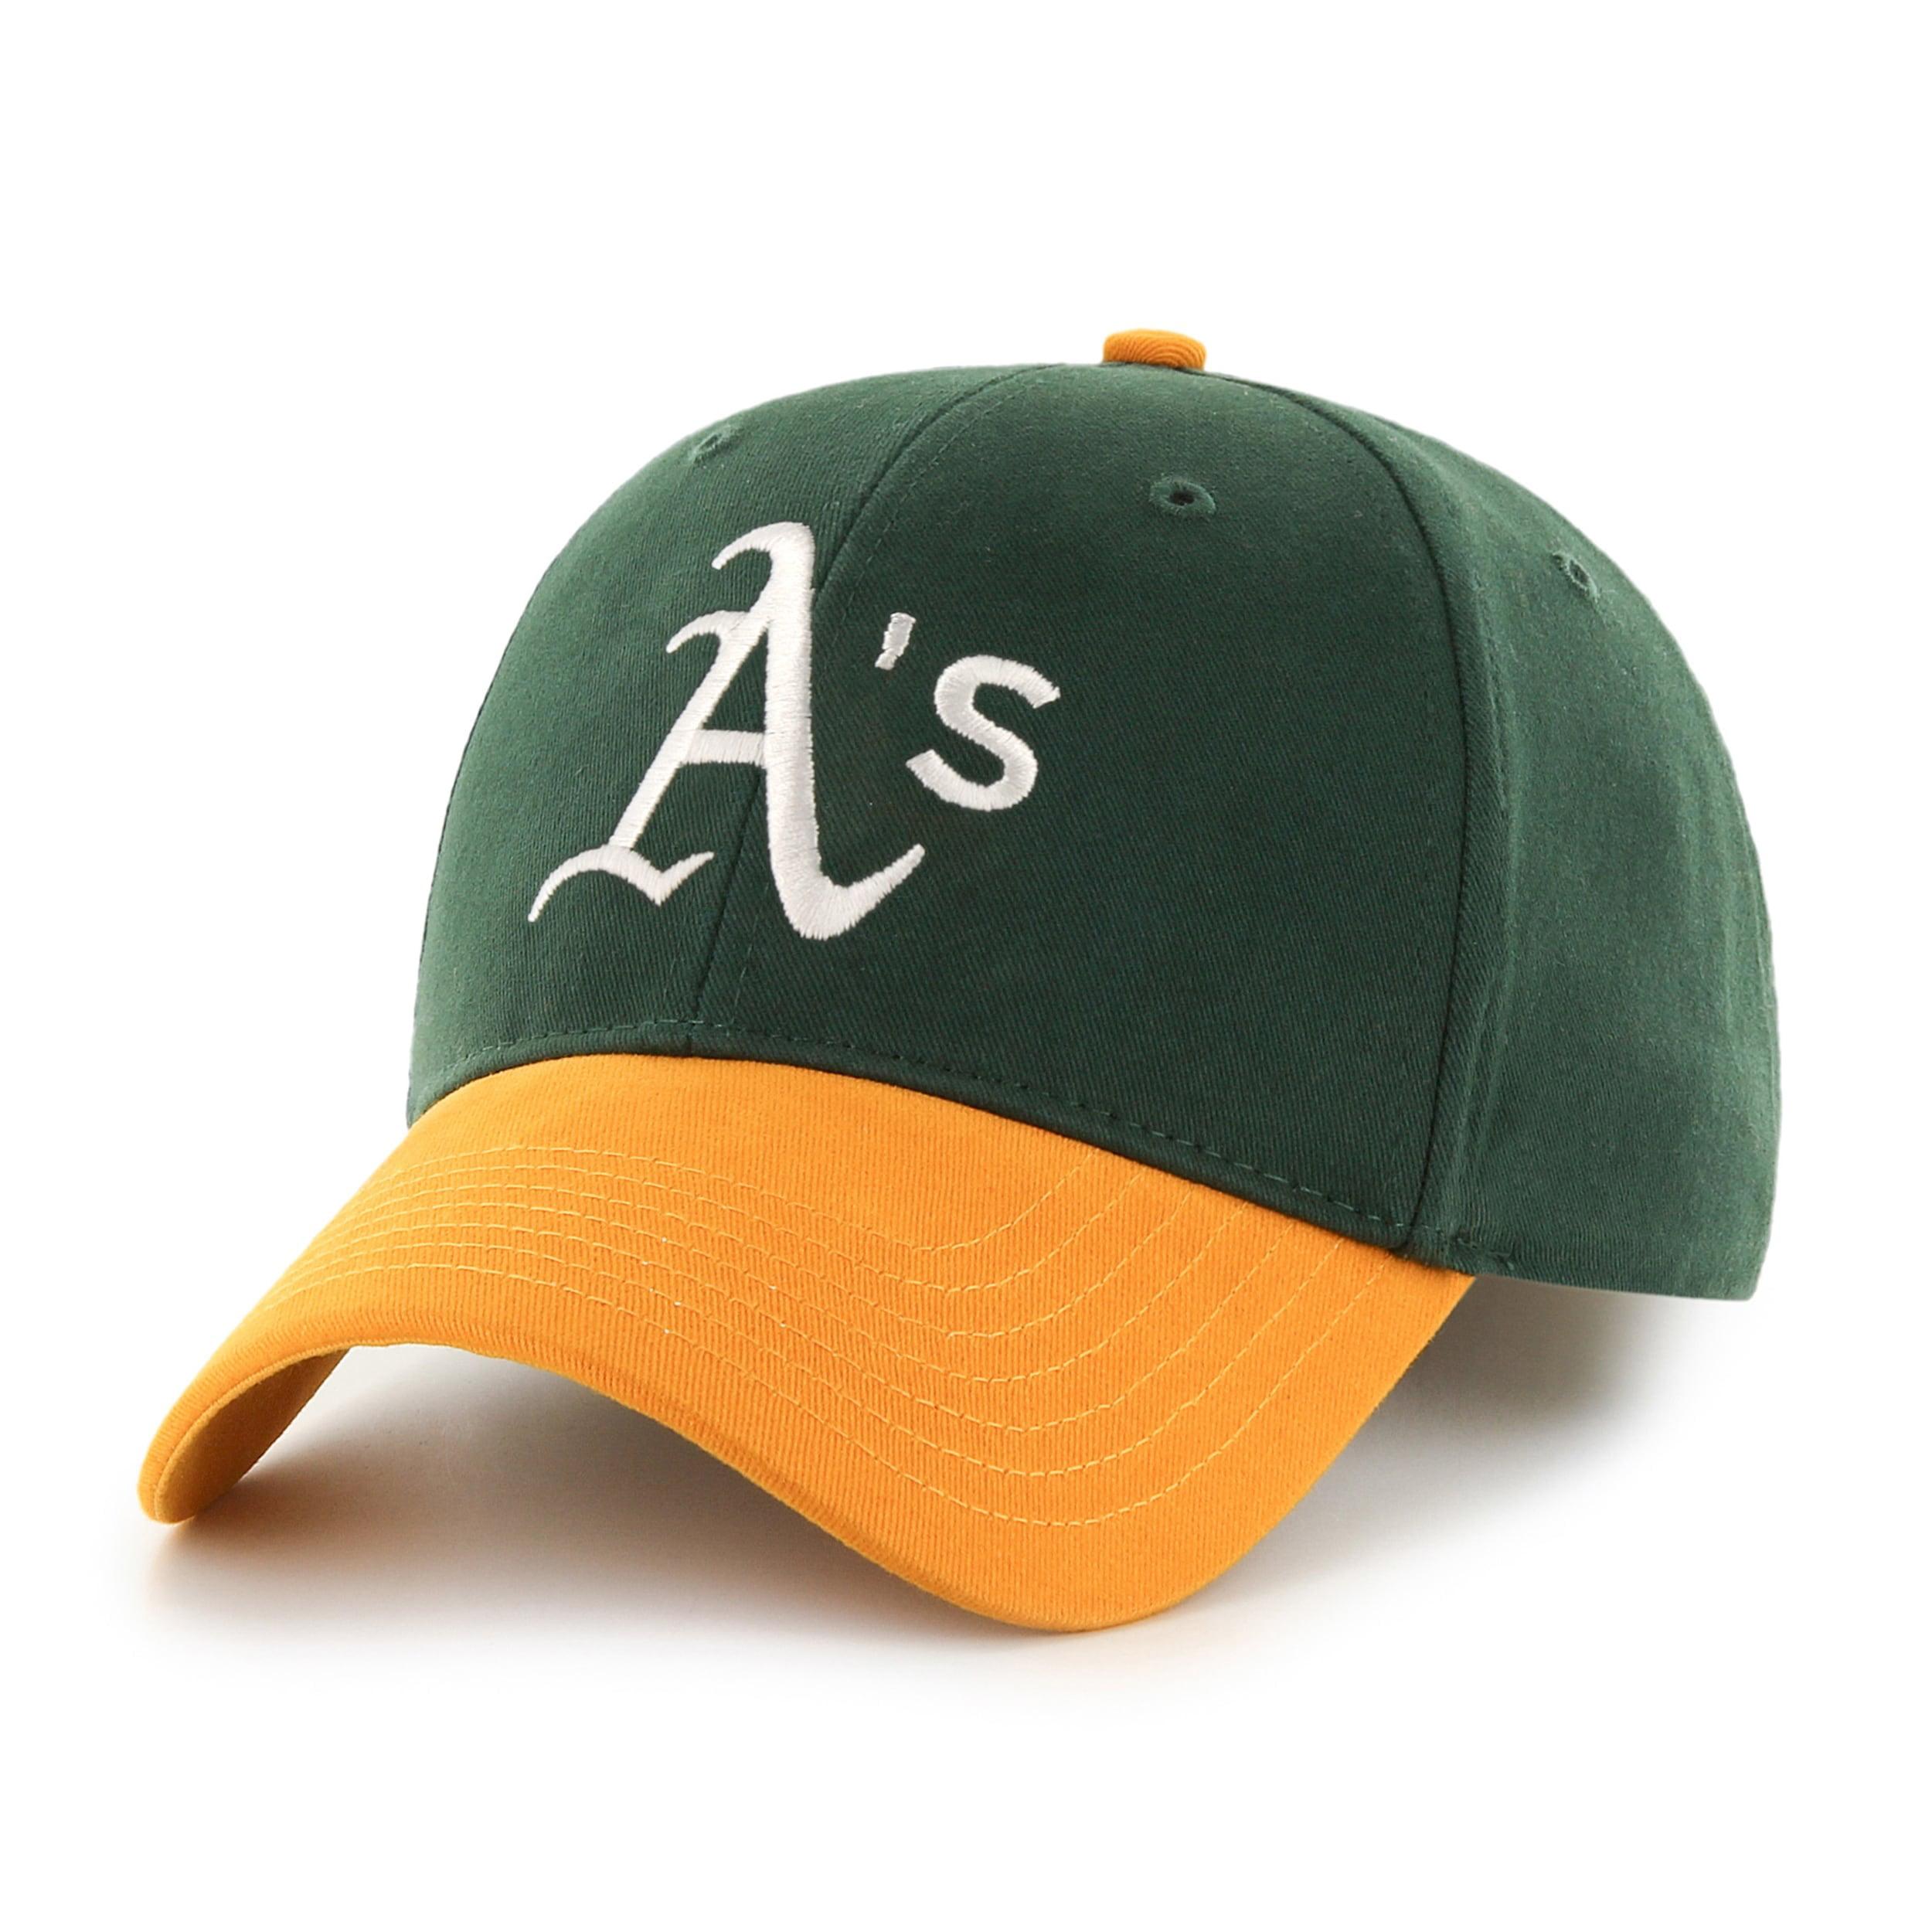 MLB Oakland Athletics Basic Cap / Hat by Fan Favorite